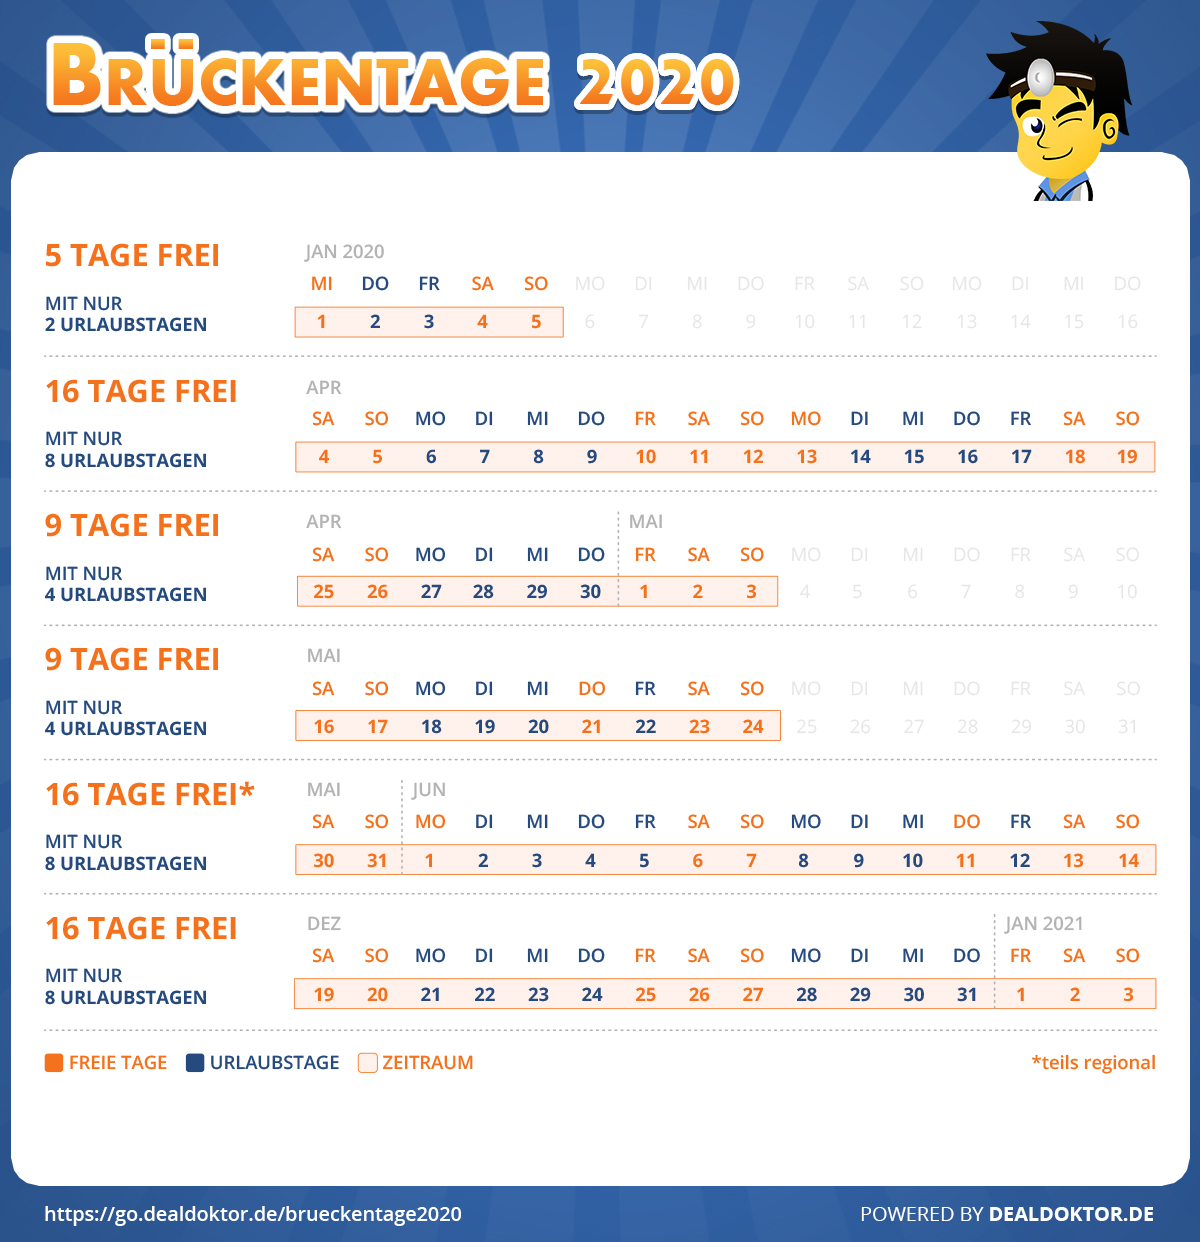 DealDoktor_Brueckentage_2020_Urlaub